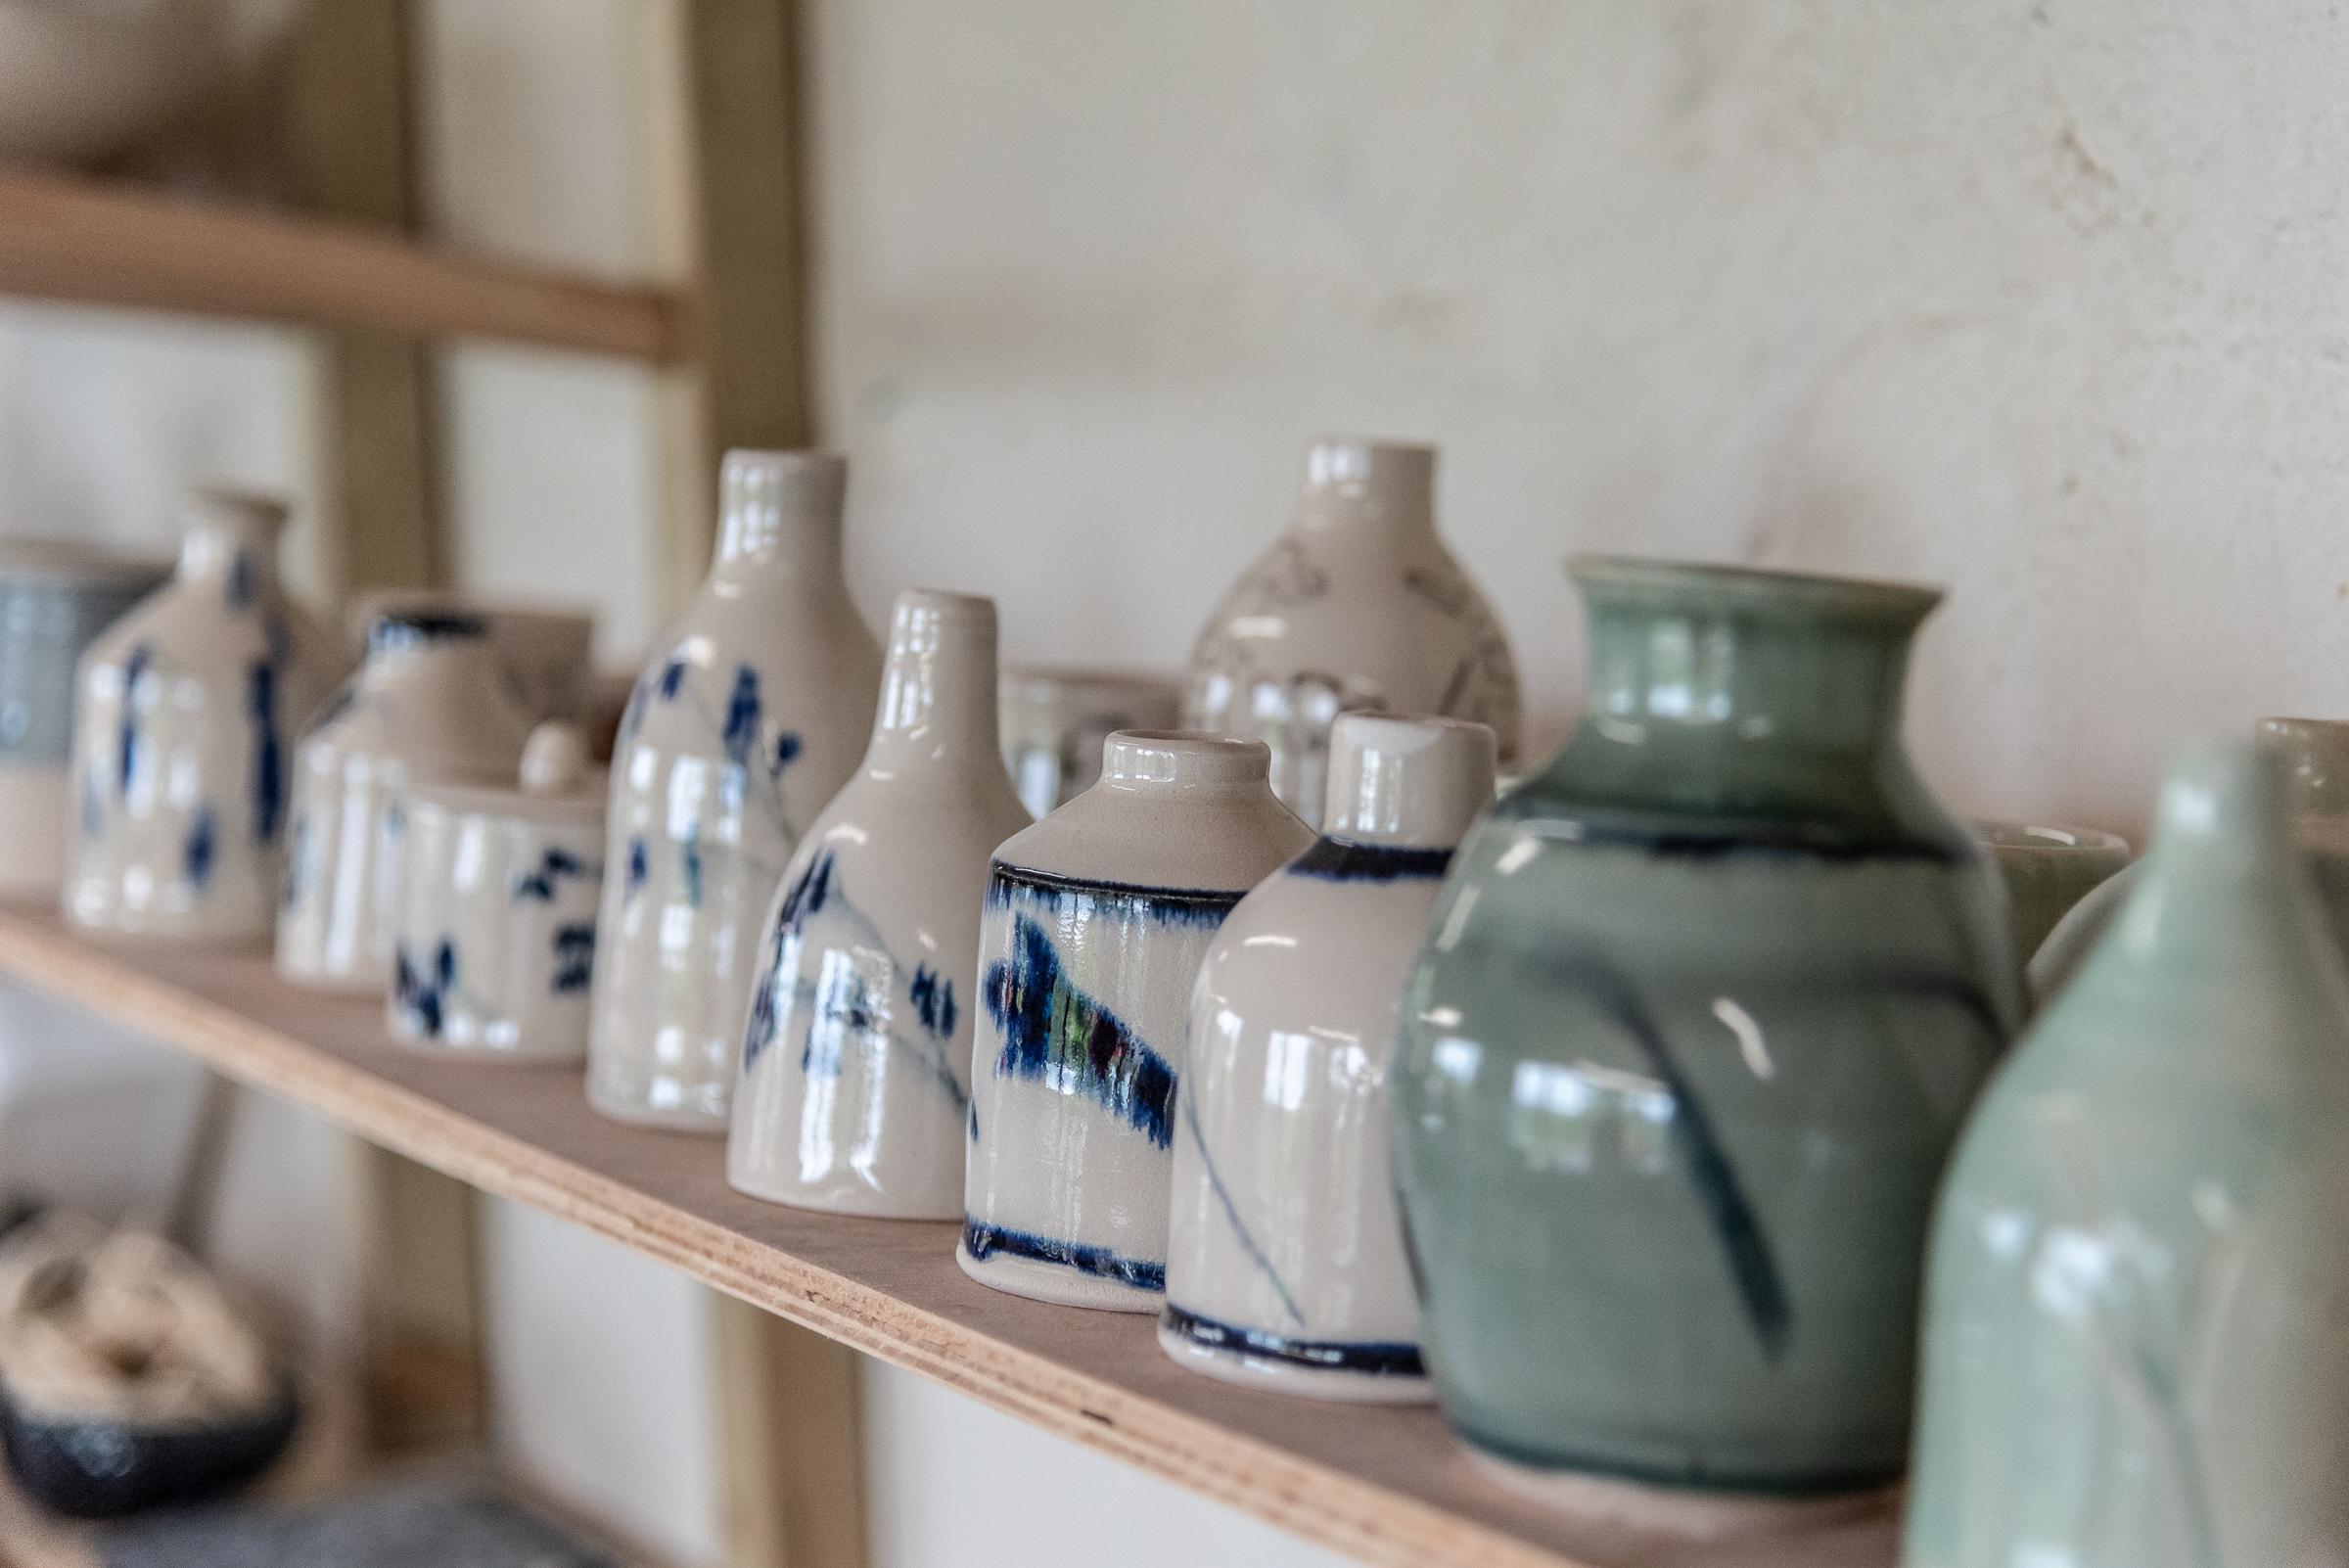 Cabalva-Pottery-2019-7565.jpg